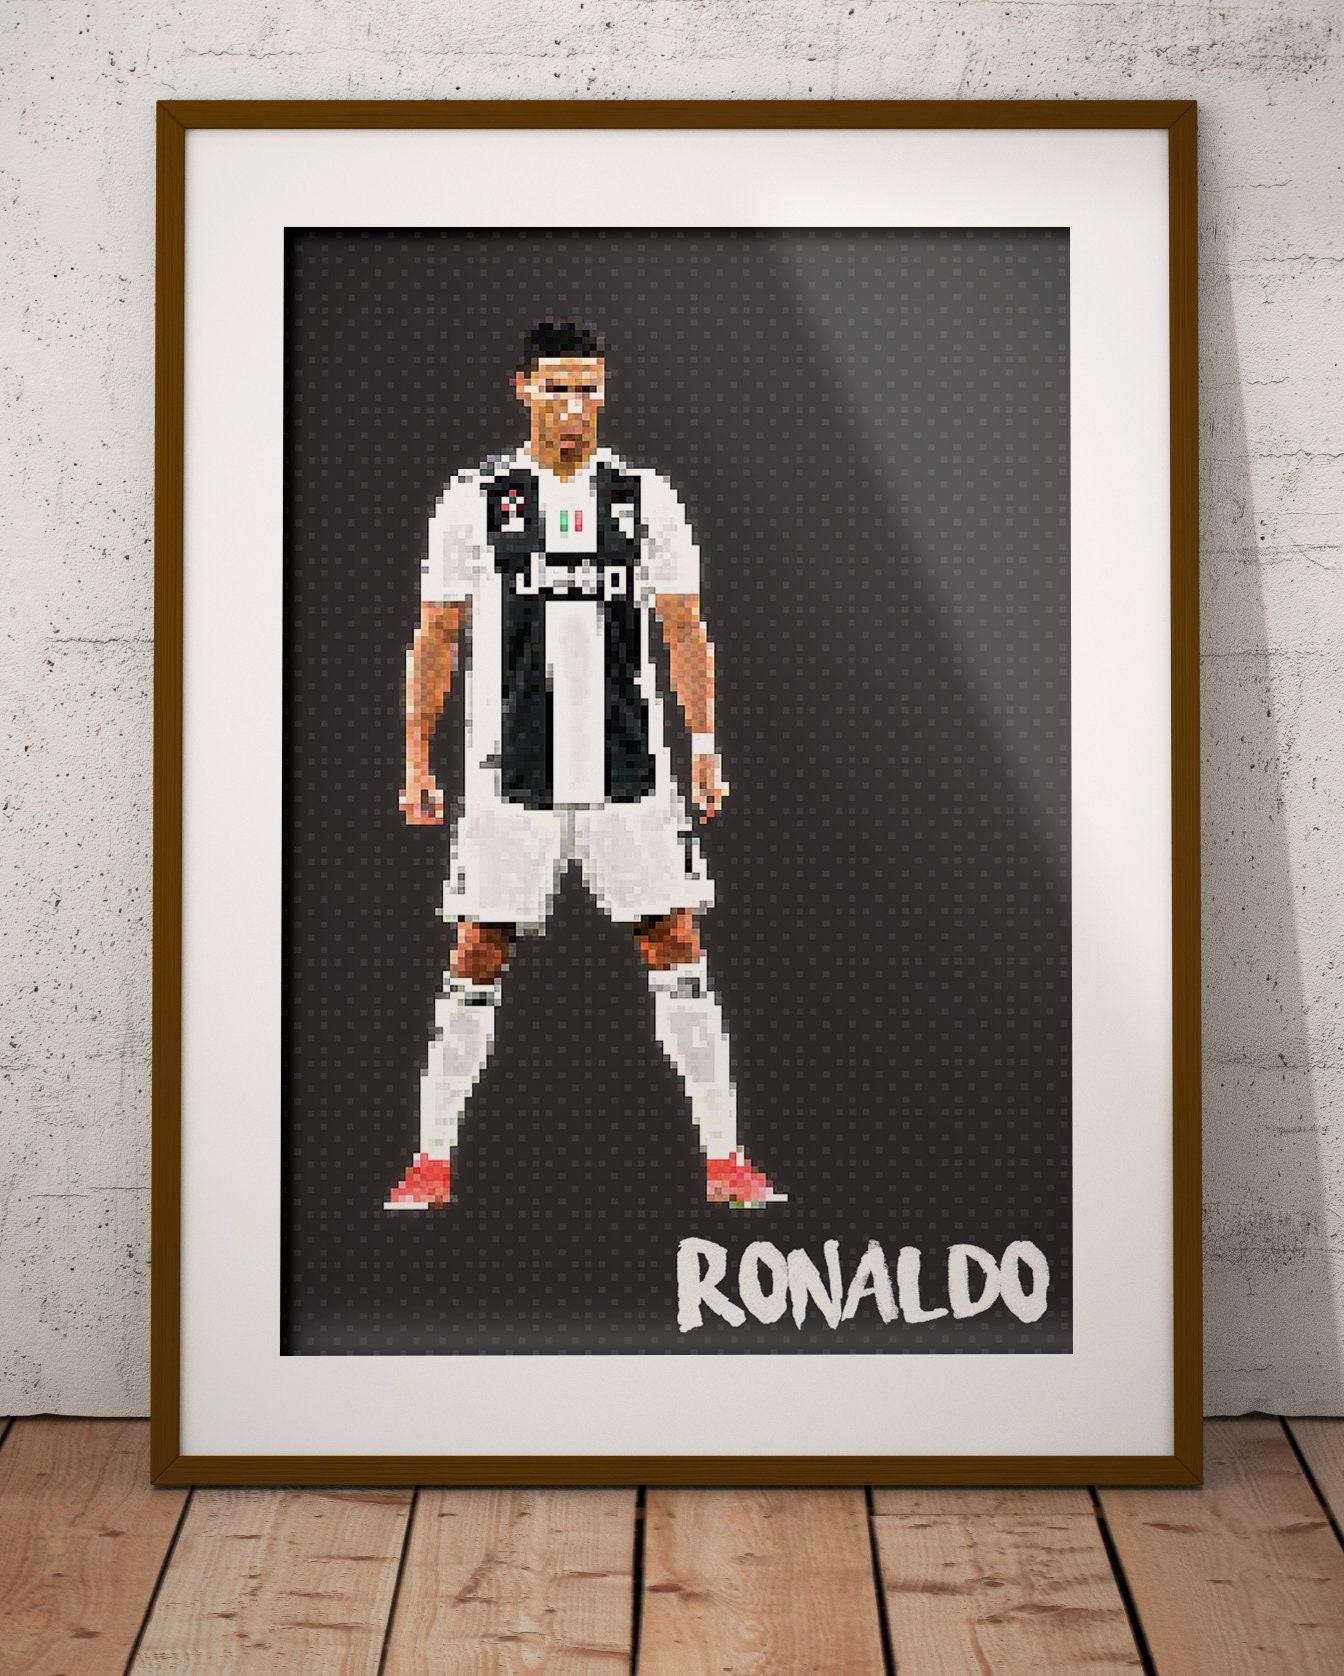 Cristiano Ronaldo Juventus Ronaldo Cr7 Poster Art Serie A Football Soccer Pixel Art